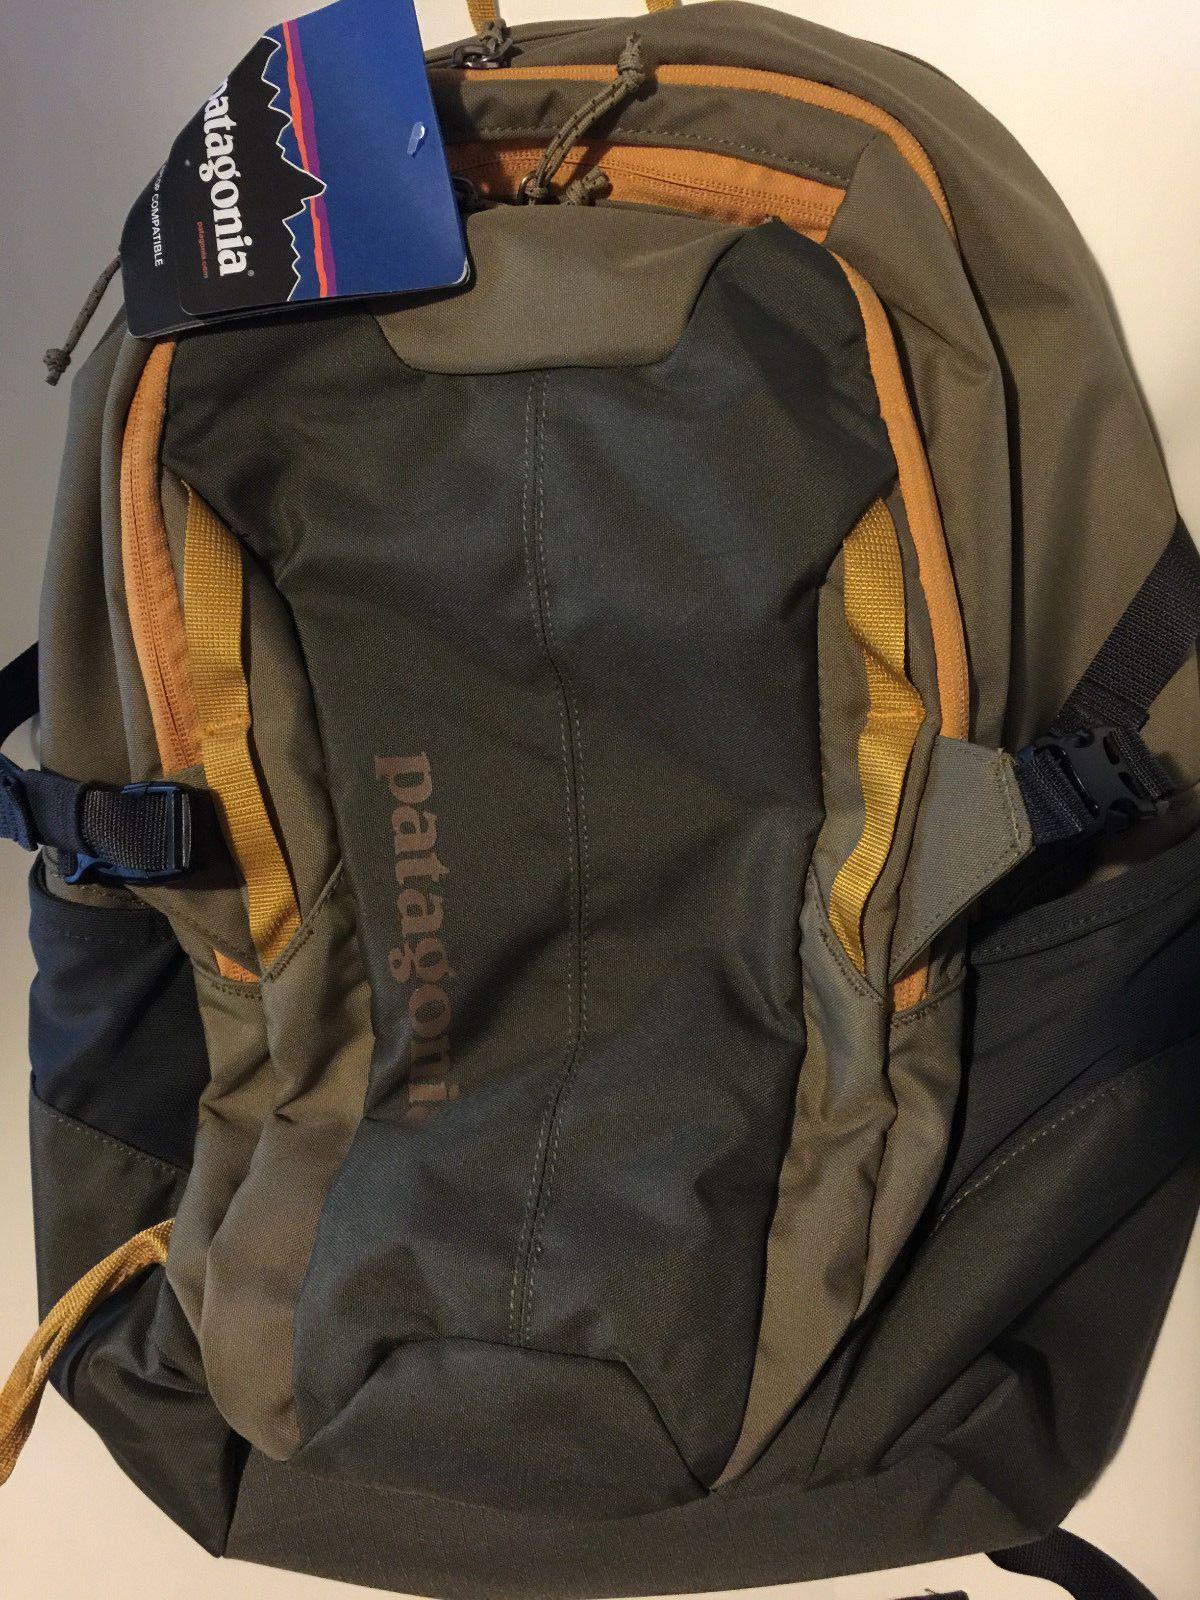 0e25d965e NEW Patagonia Refugio 28L Transport Backpack - Ash Tan | eBay ...